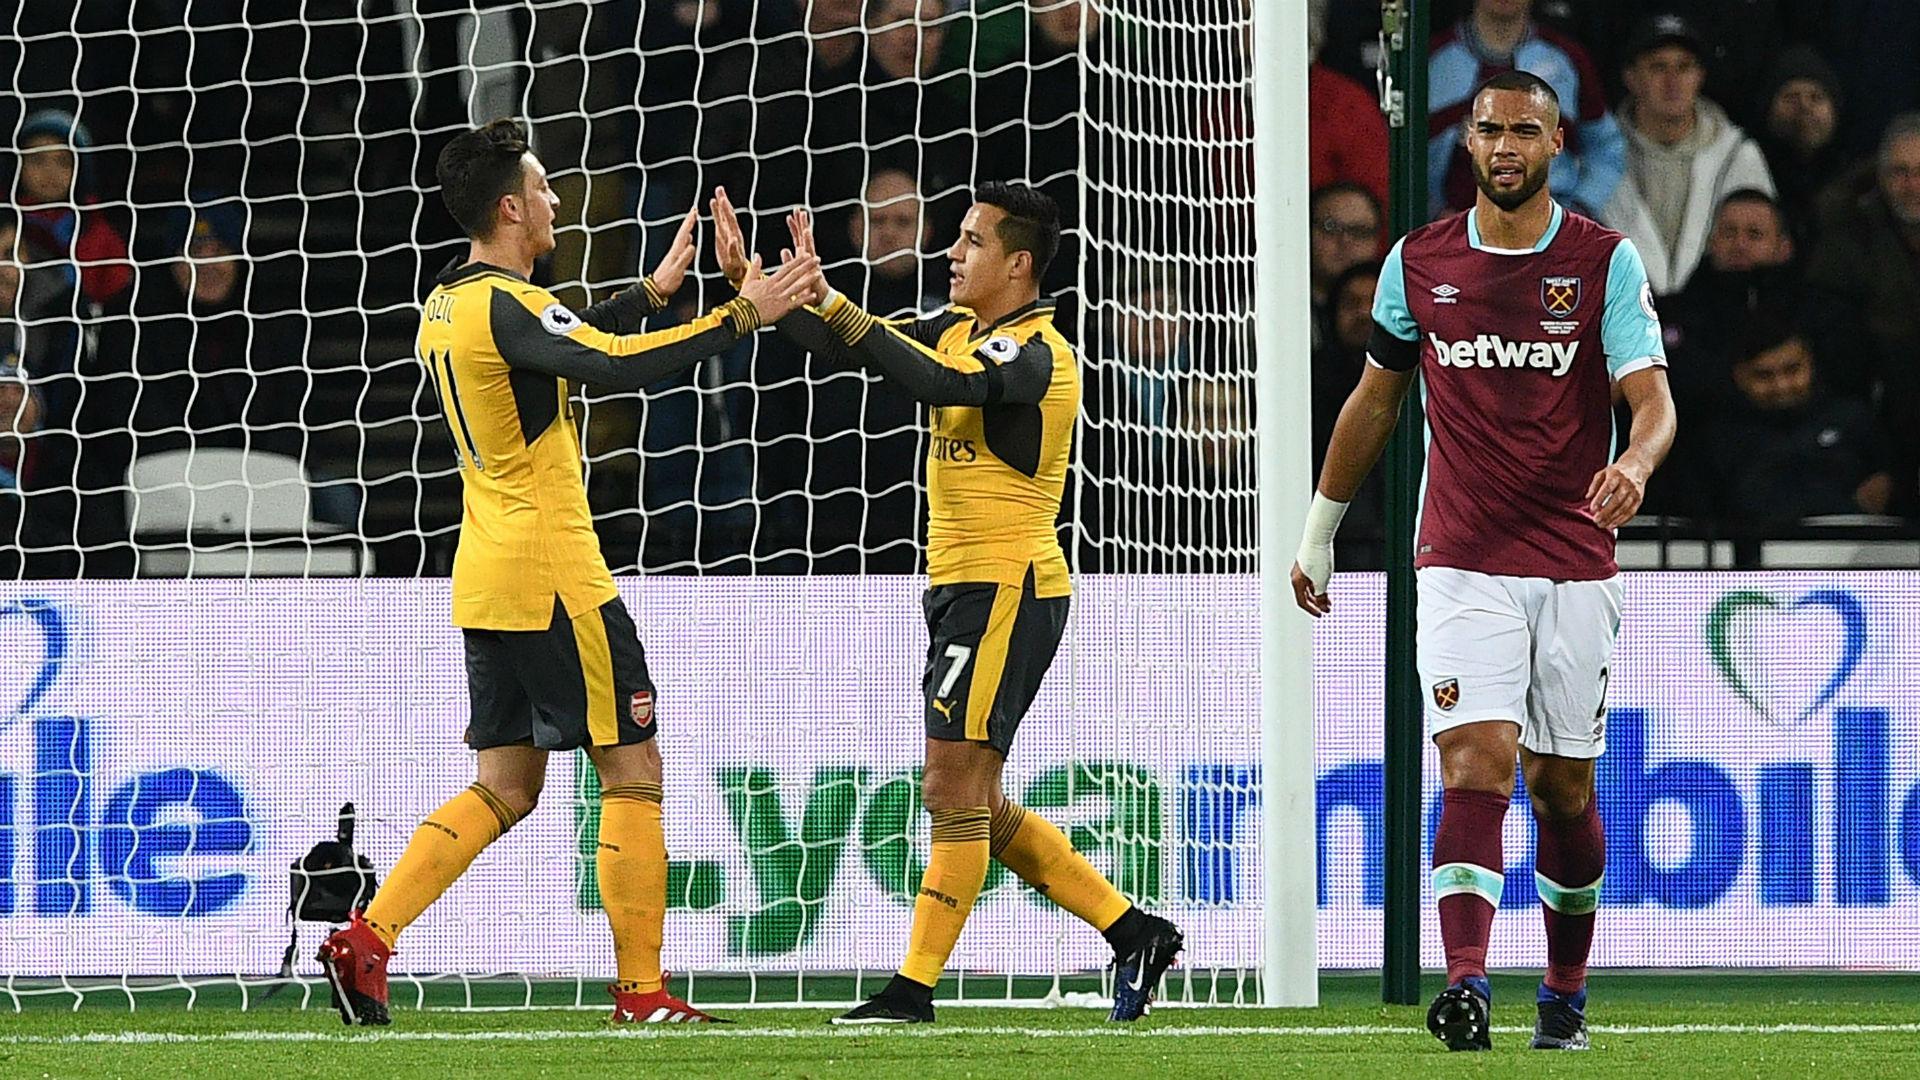 West Ham vs Arsenal  - Highlight | Dec 3, 2016